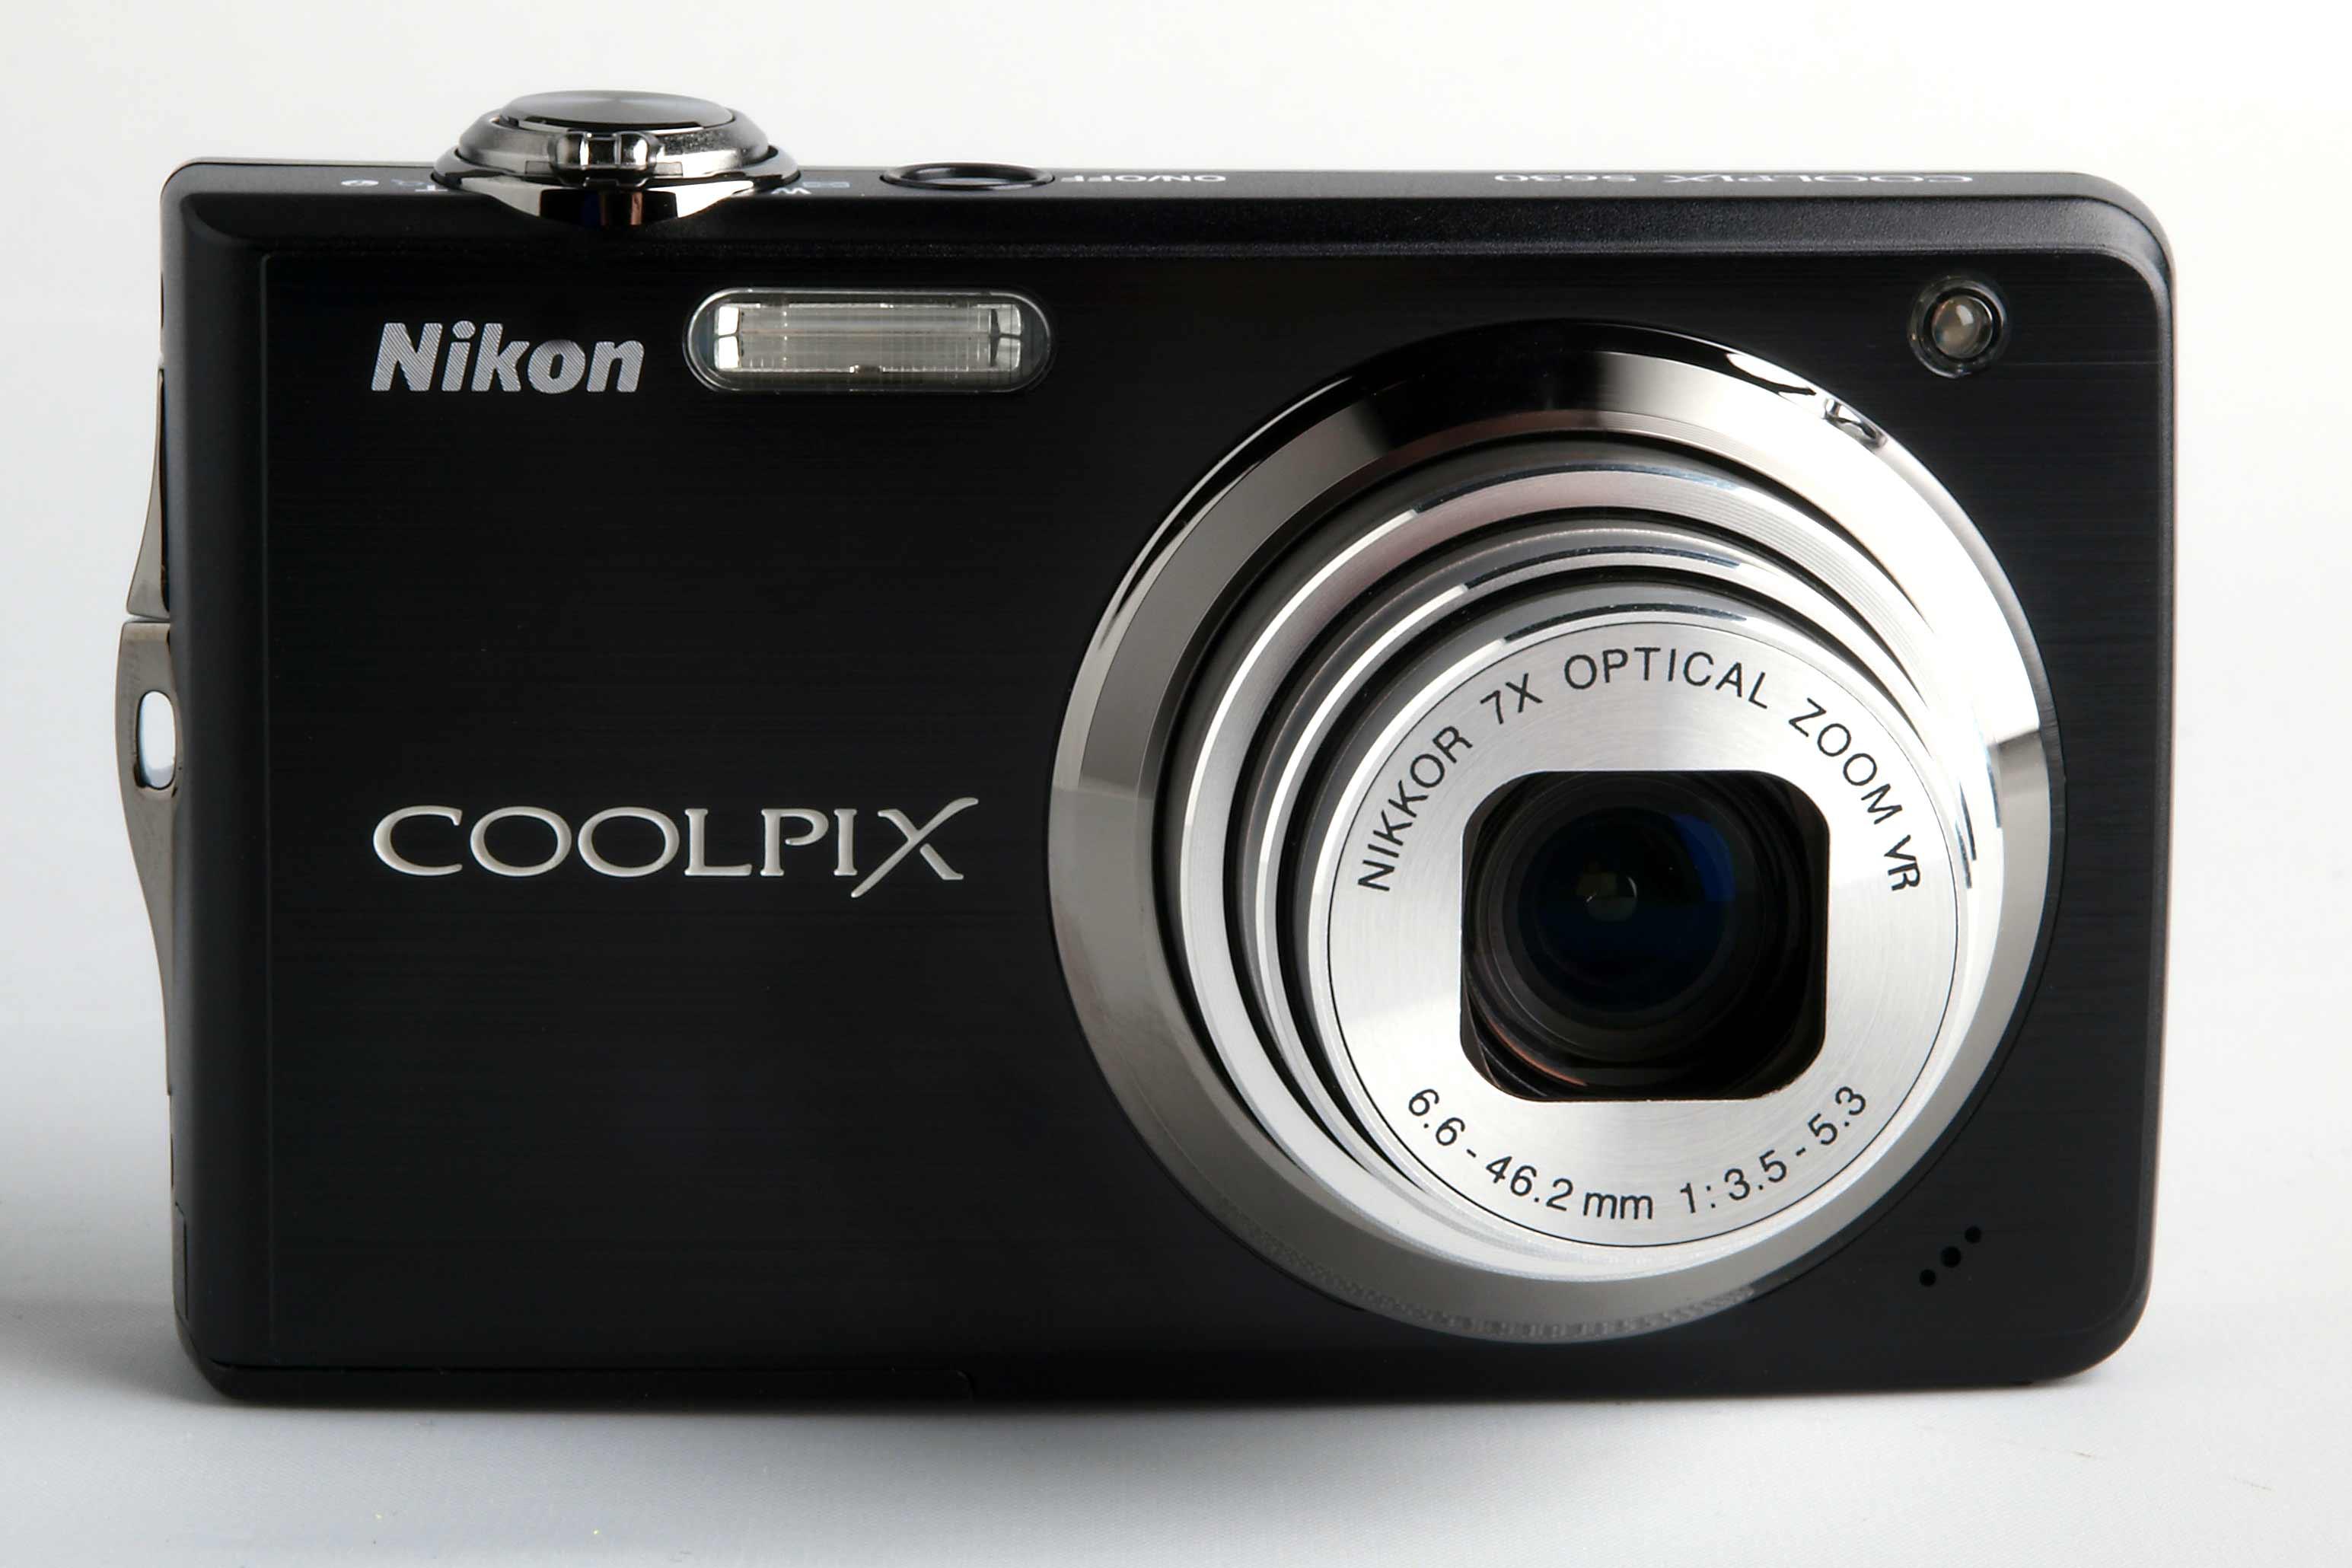 nikon coolpix s630 digital camera review rh ephotozine com nikon coolpix s630 instructions nikon coolpix s620 manual